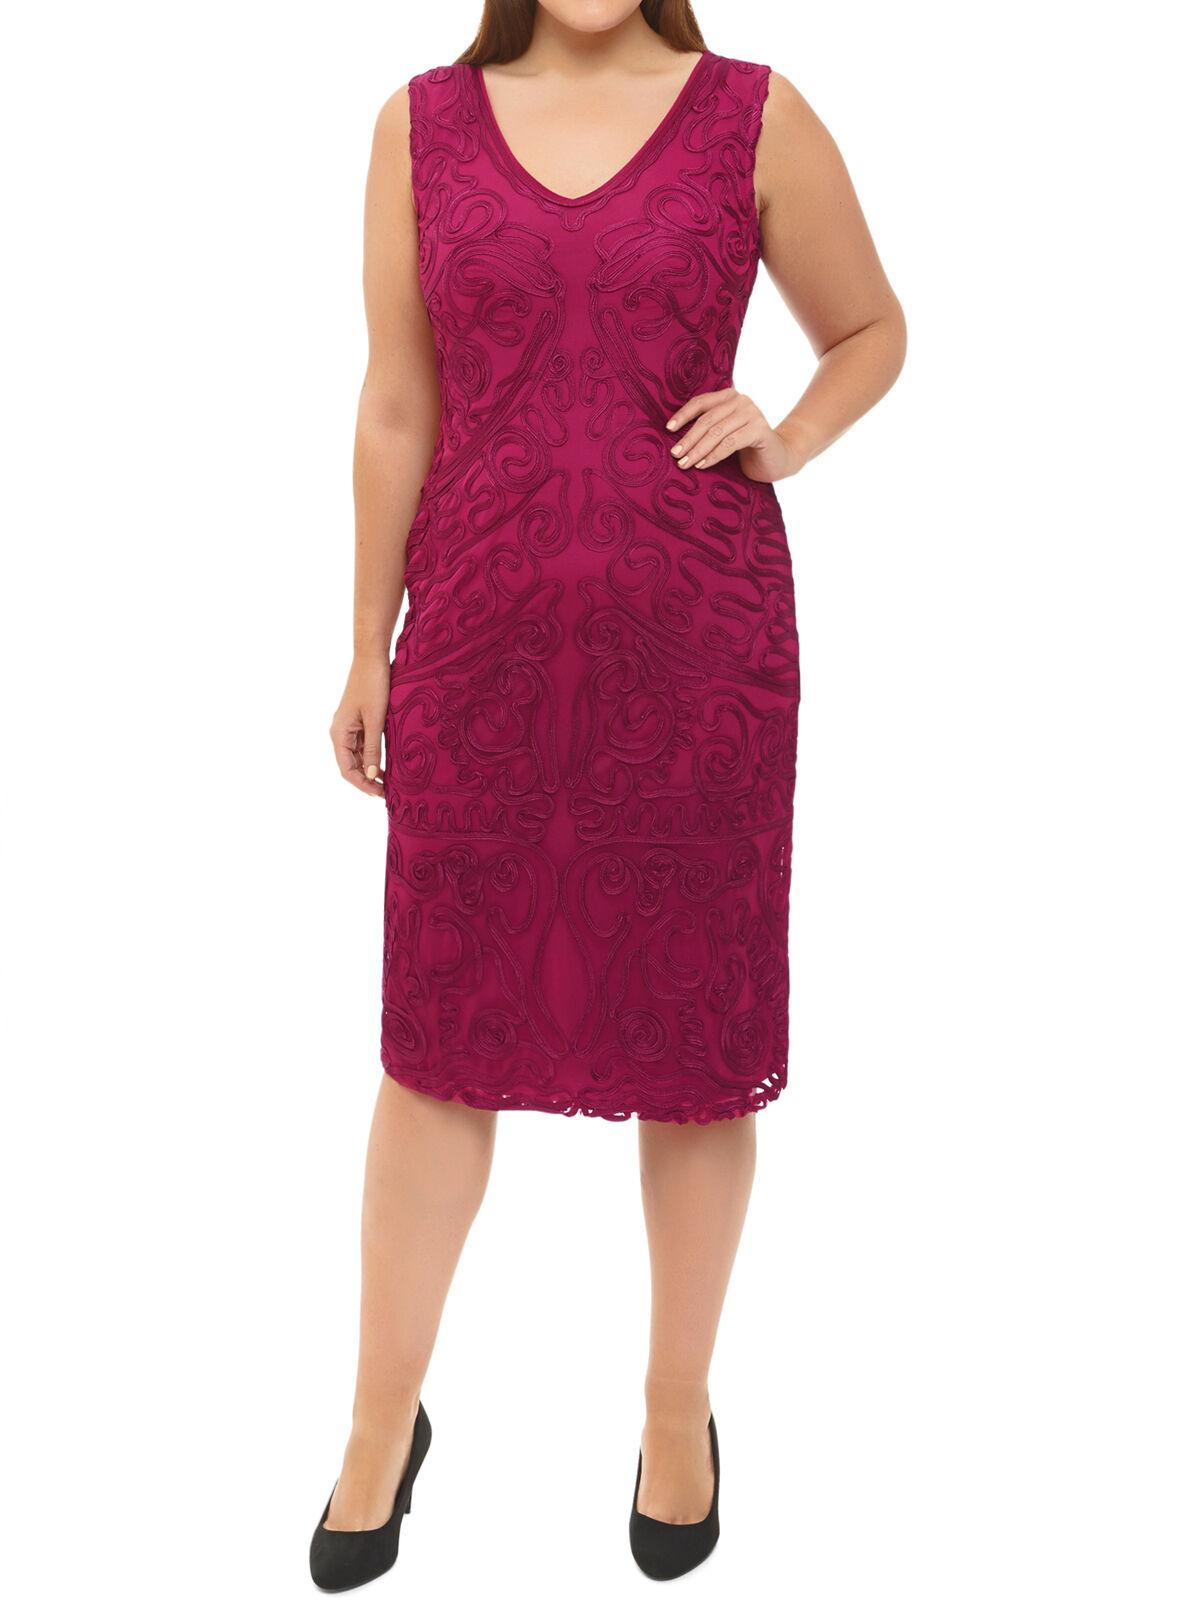 NEW GORGEOUS WINDSMOOR RASPBERRY Rosa CORNELLI  SLEEVLESS SHIFT DRESS UK12-24